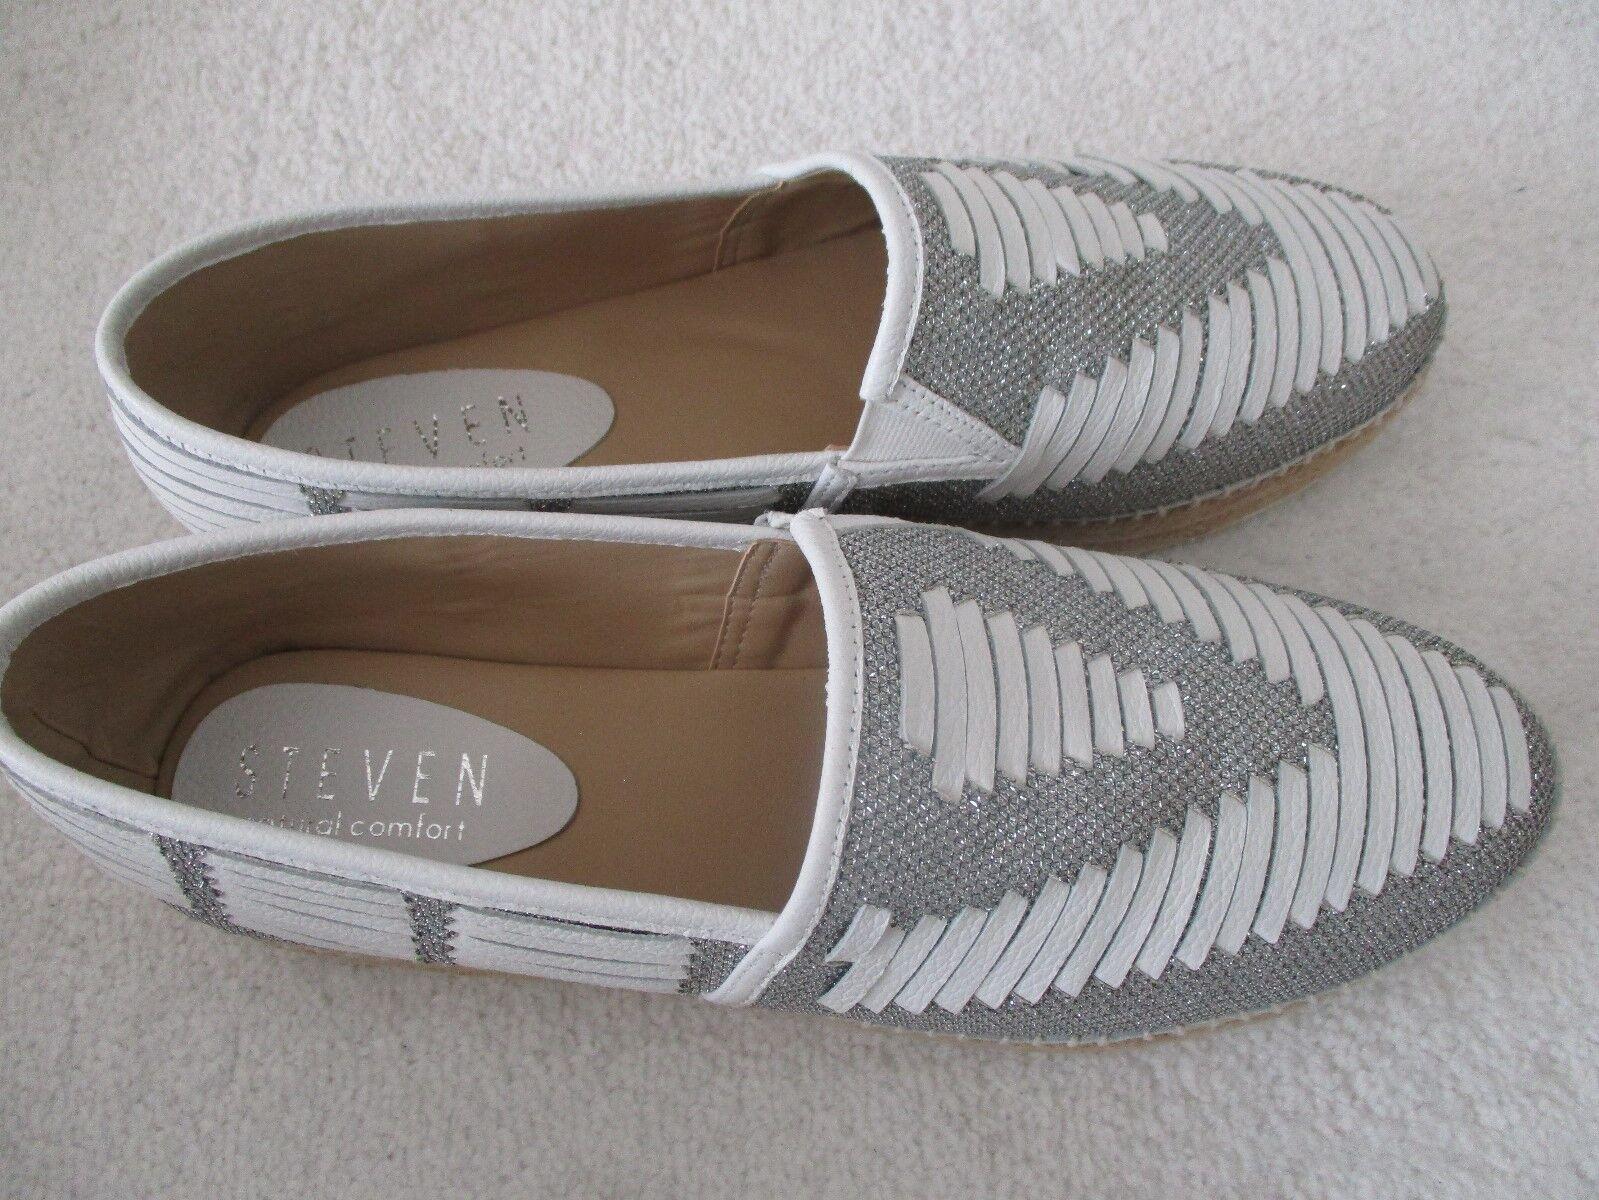 STEVEN M NATURAL COMFORT Weiß NC-CHARM FLAT Schuhe SIZE 8 M STEVEN - NEW W BOX c4e66b